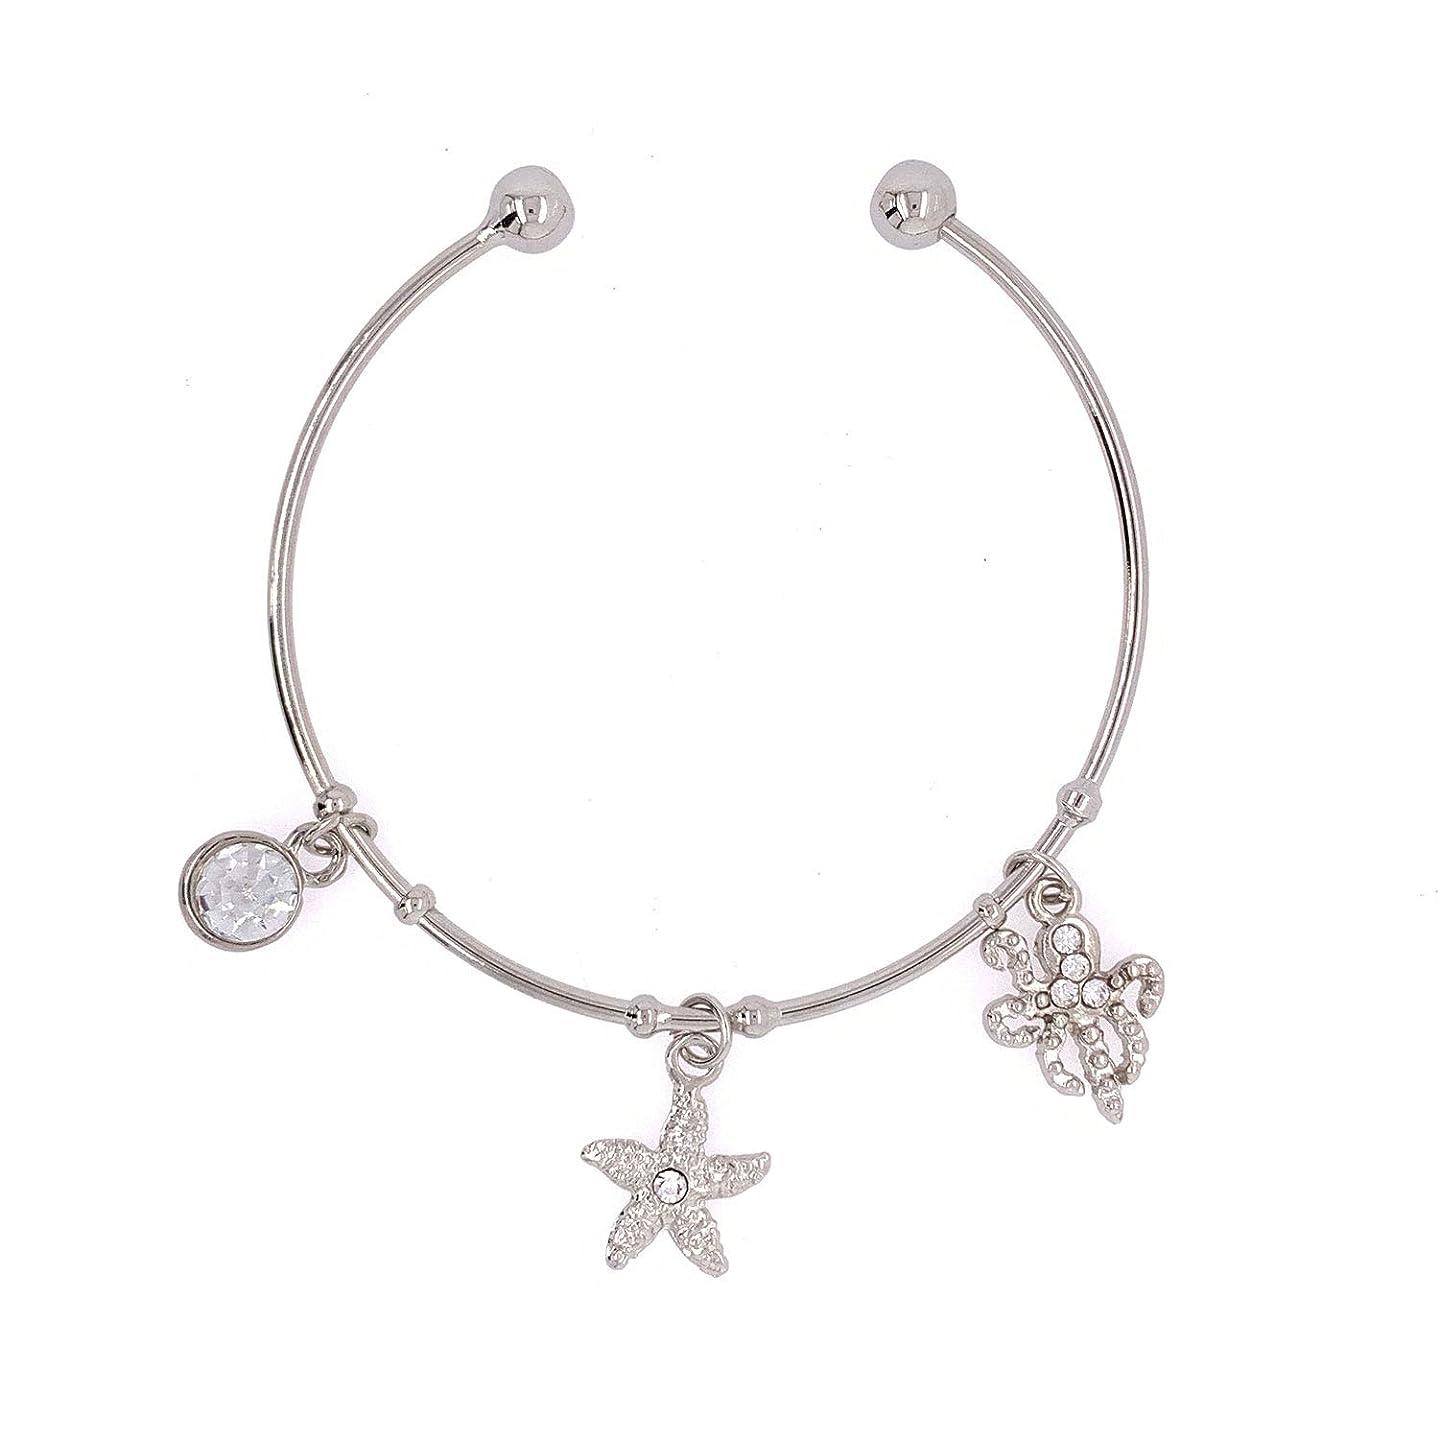 Jewelry Made By Me Coastal Silver Bangle Bracelet with 3 Charms